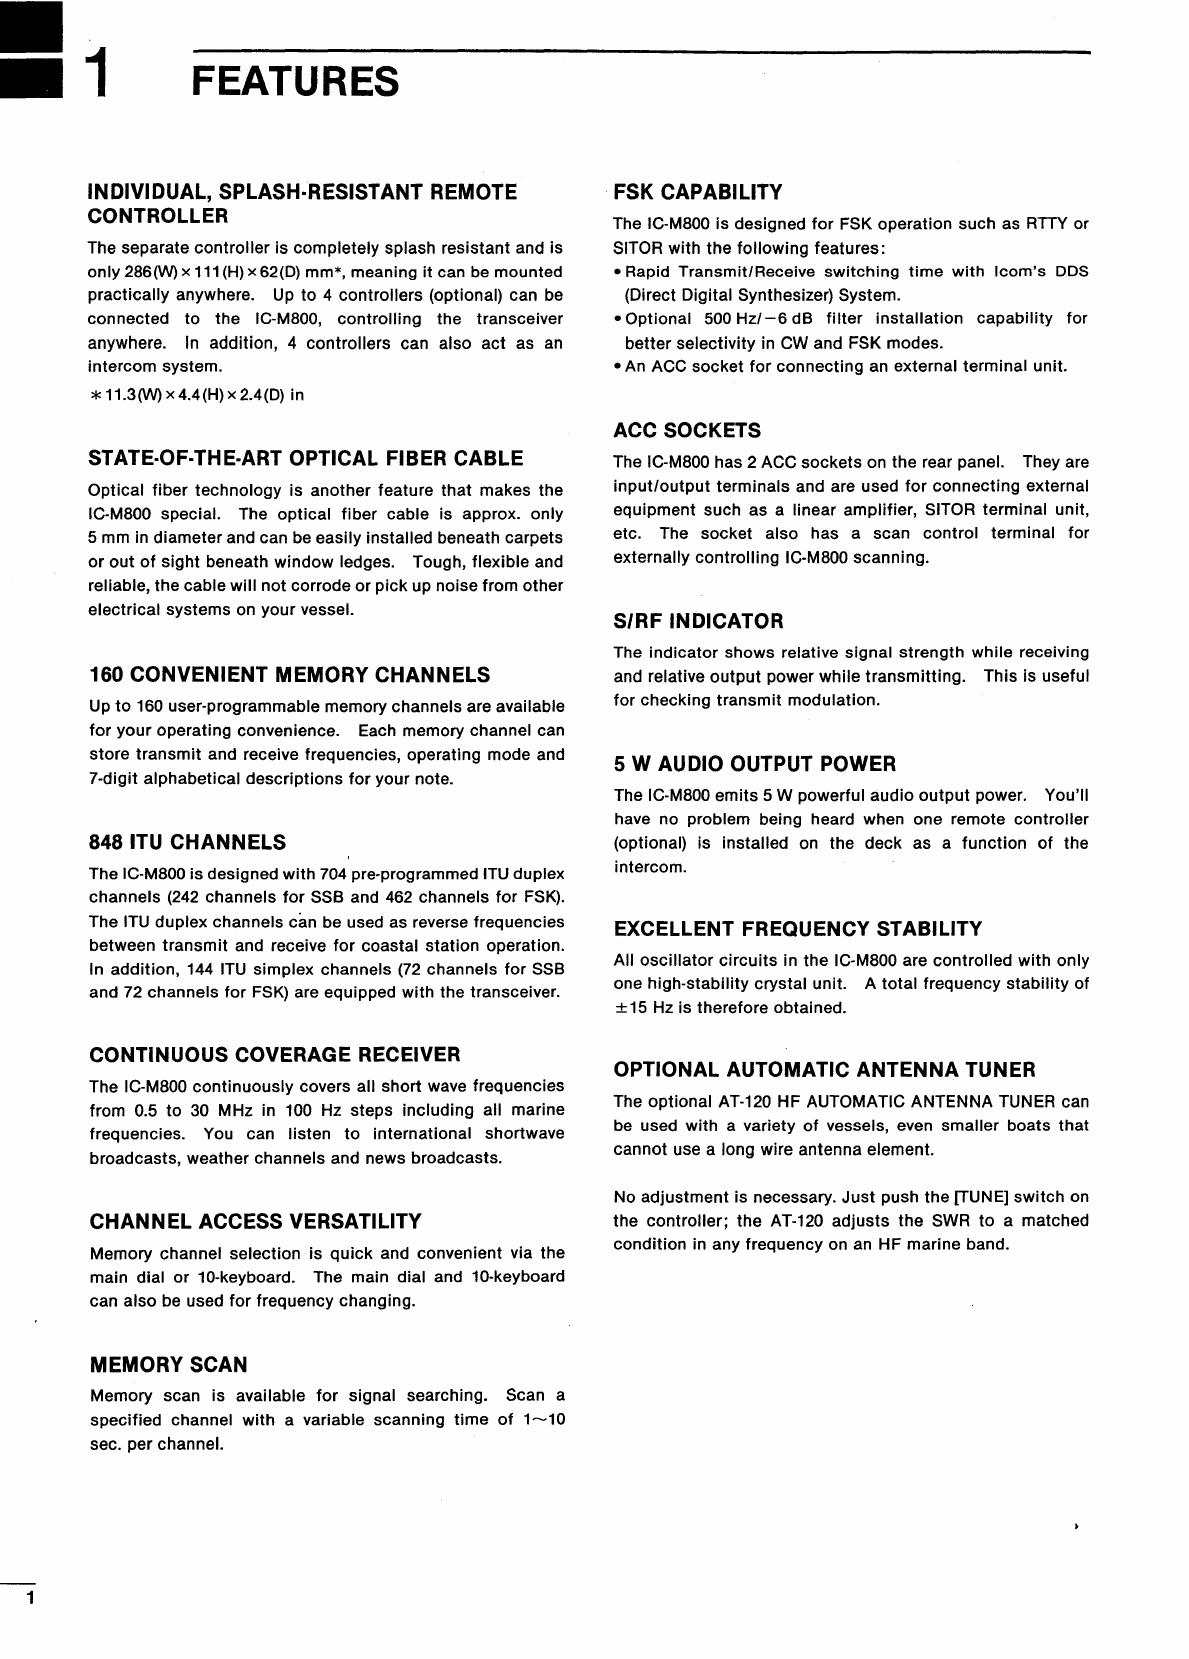 Manual Icom IC-M800 (page 1 of 32) (English)